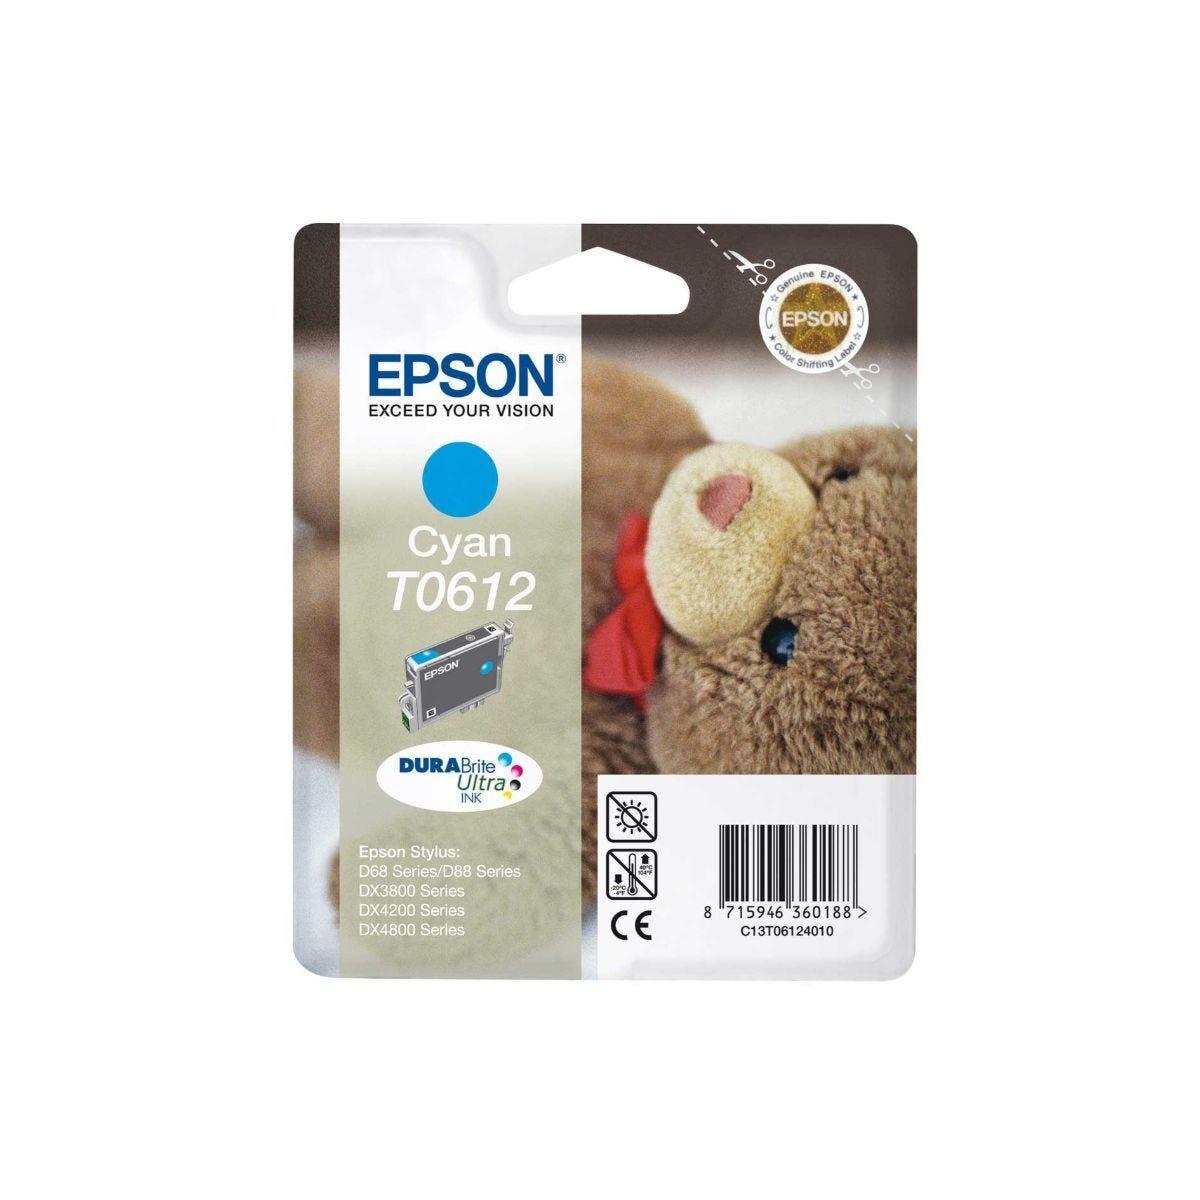 Epson T0612 Ink Cartridge